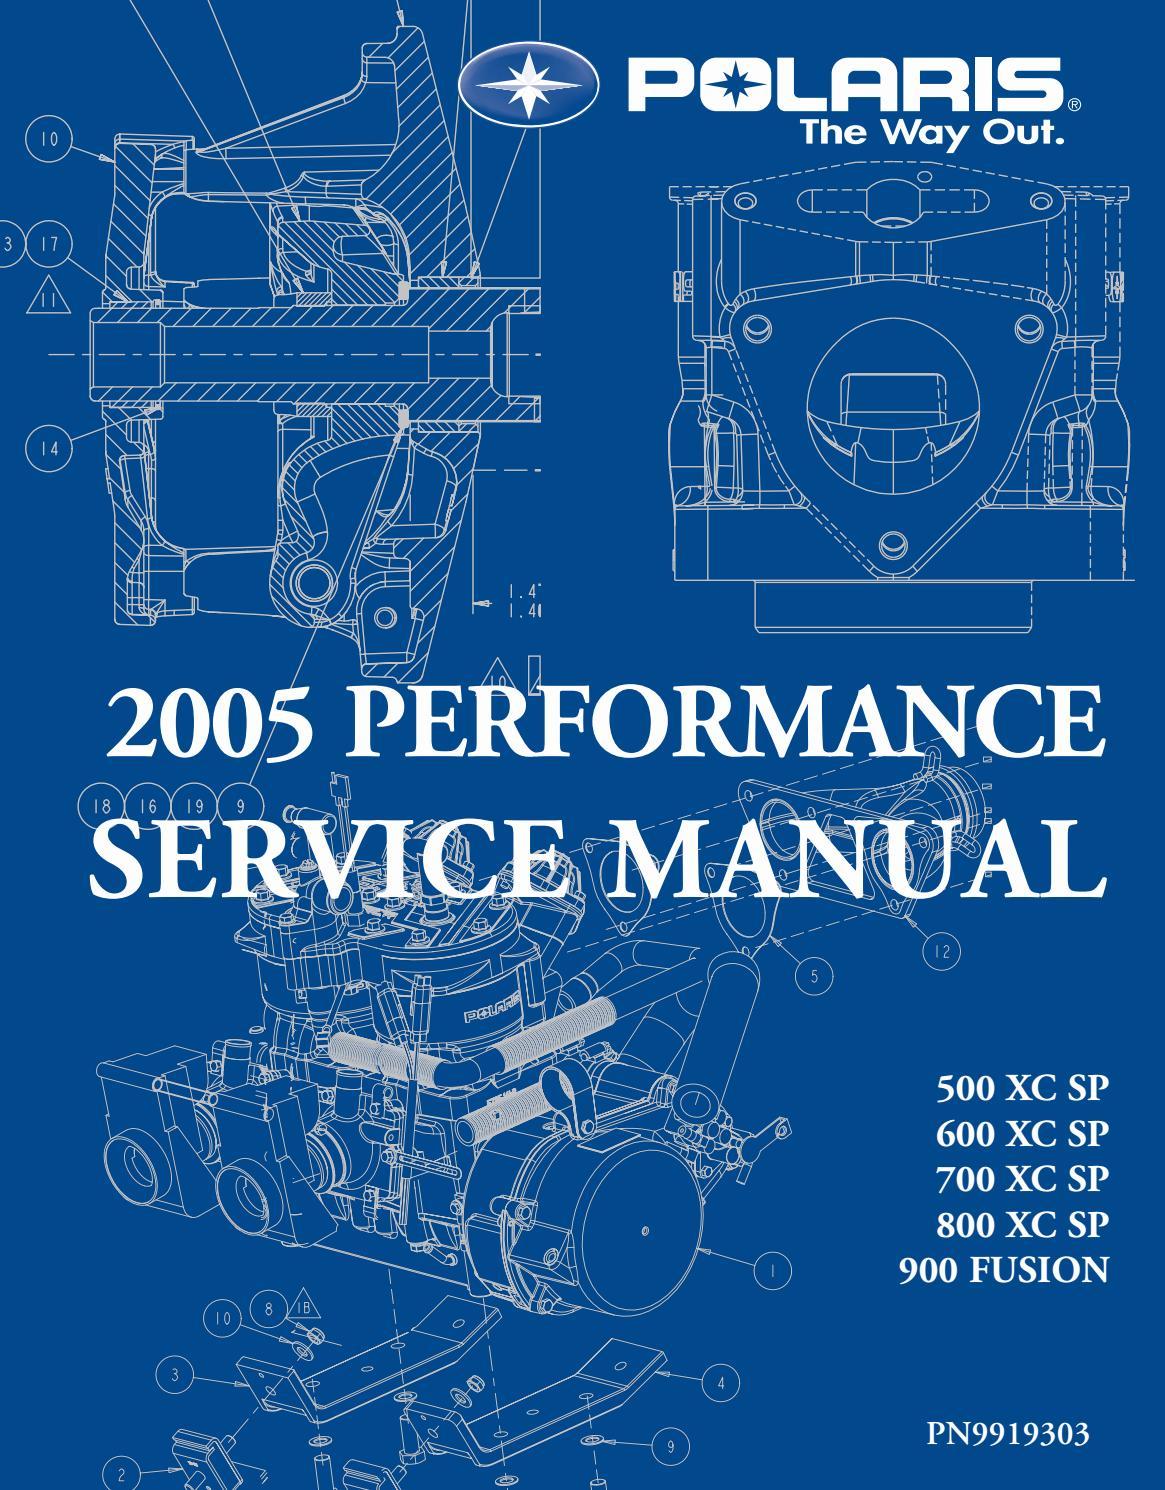 Polaris Fusion 600 Wiring Diagram Electrical Diagrams 2006 Rmk 700 Complete U2022